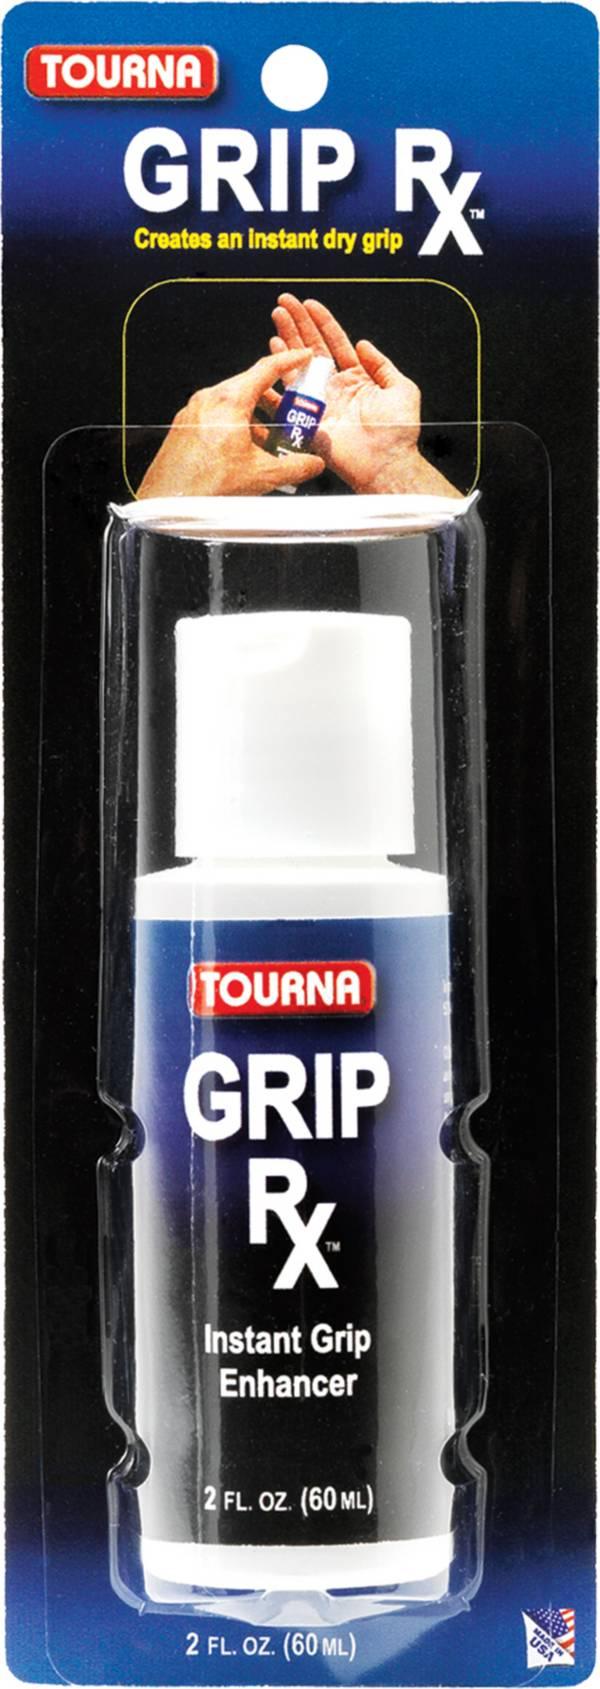 Tourna Tennis Grip Rx product image